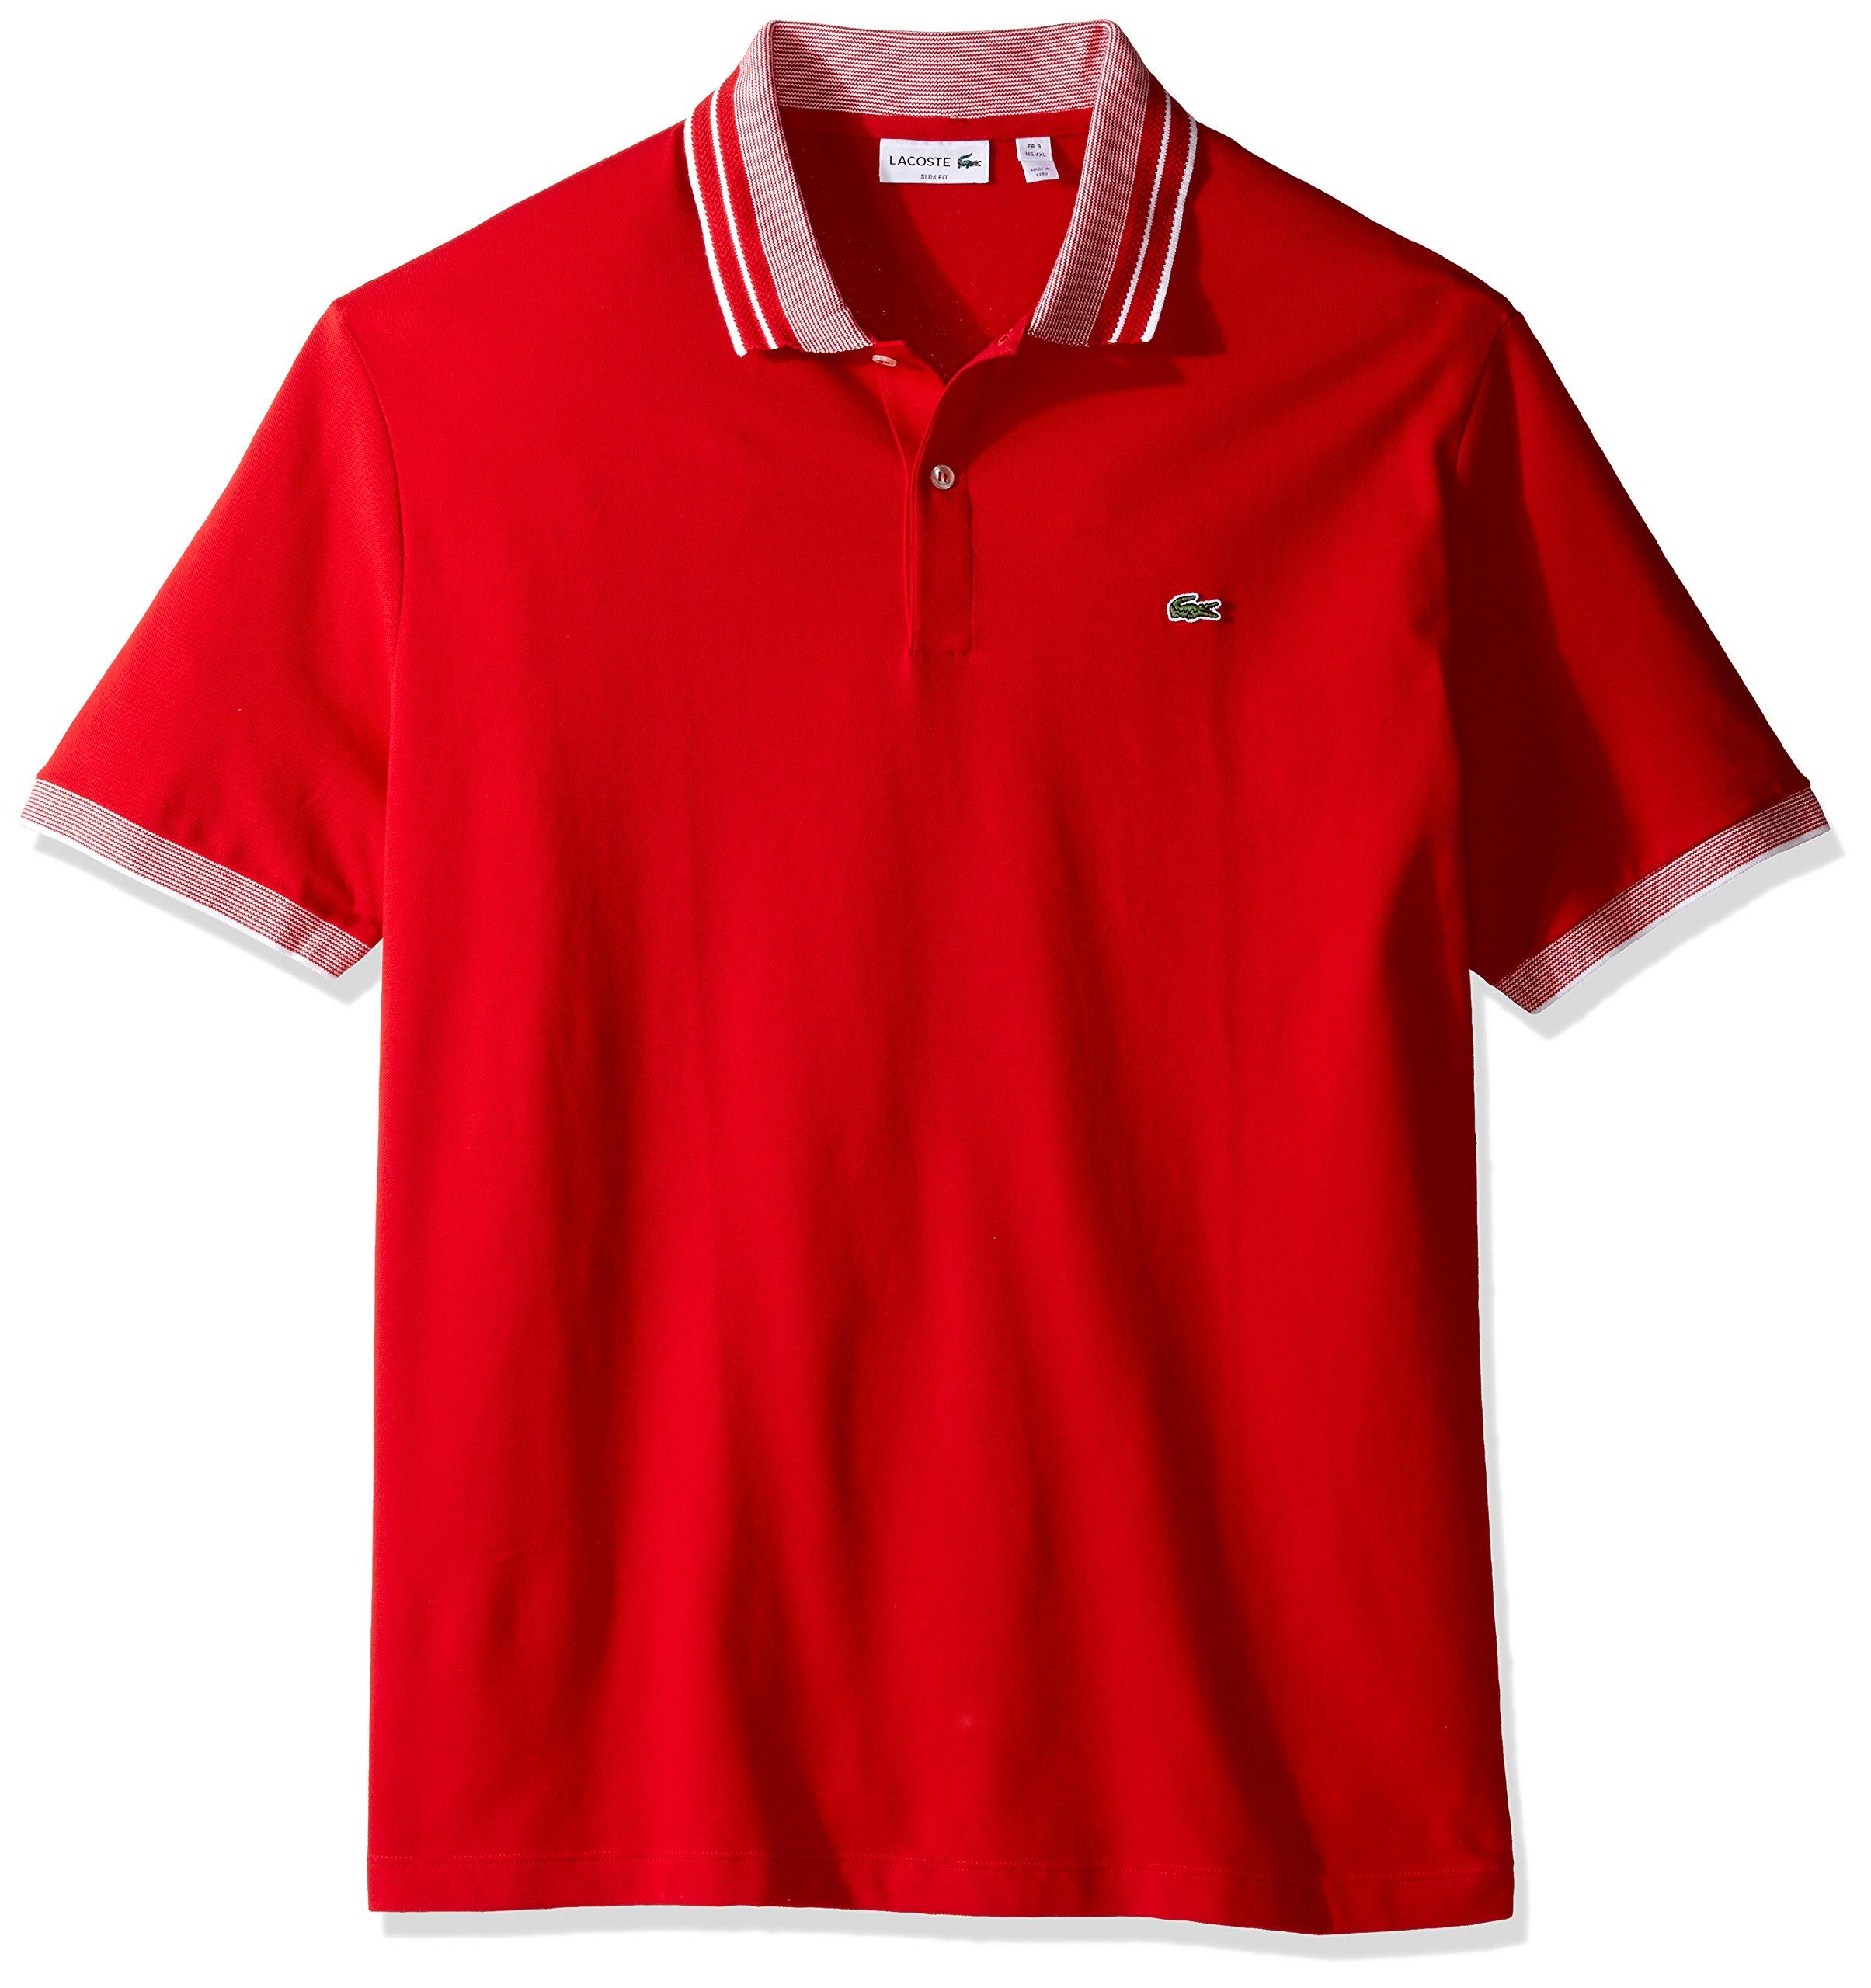 Lacoste Men's Short Sleeve Semi Fancy Stretch with Fine Stripe Slim Polo, Red/White, 6